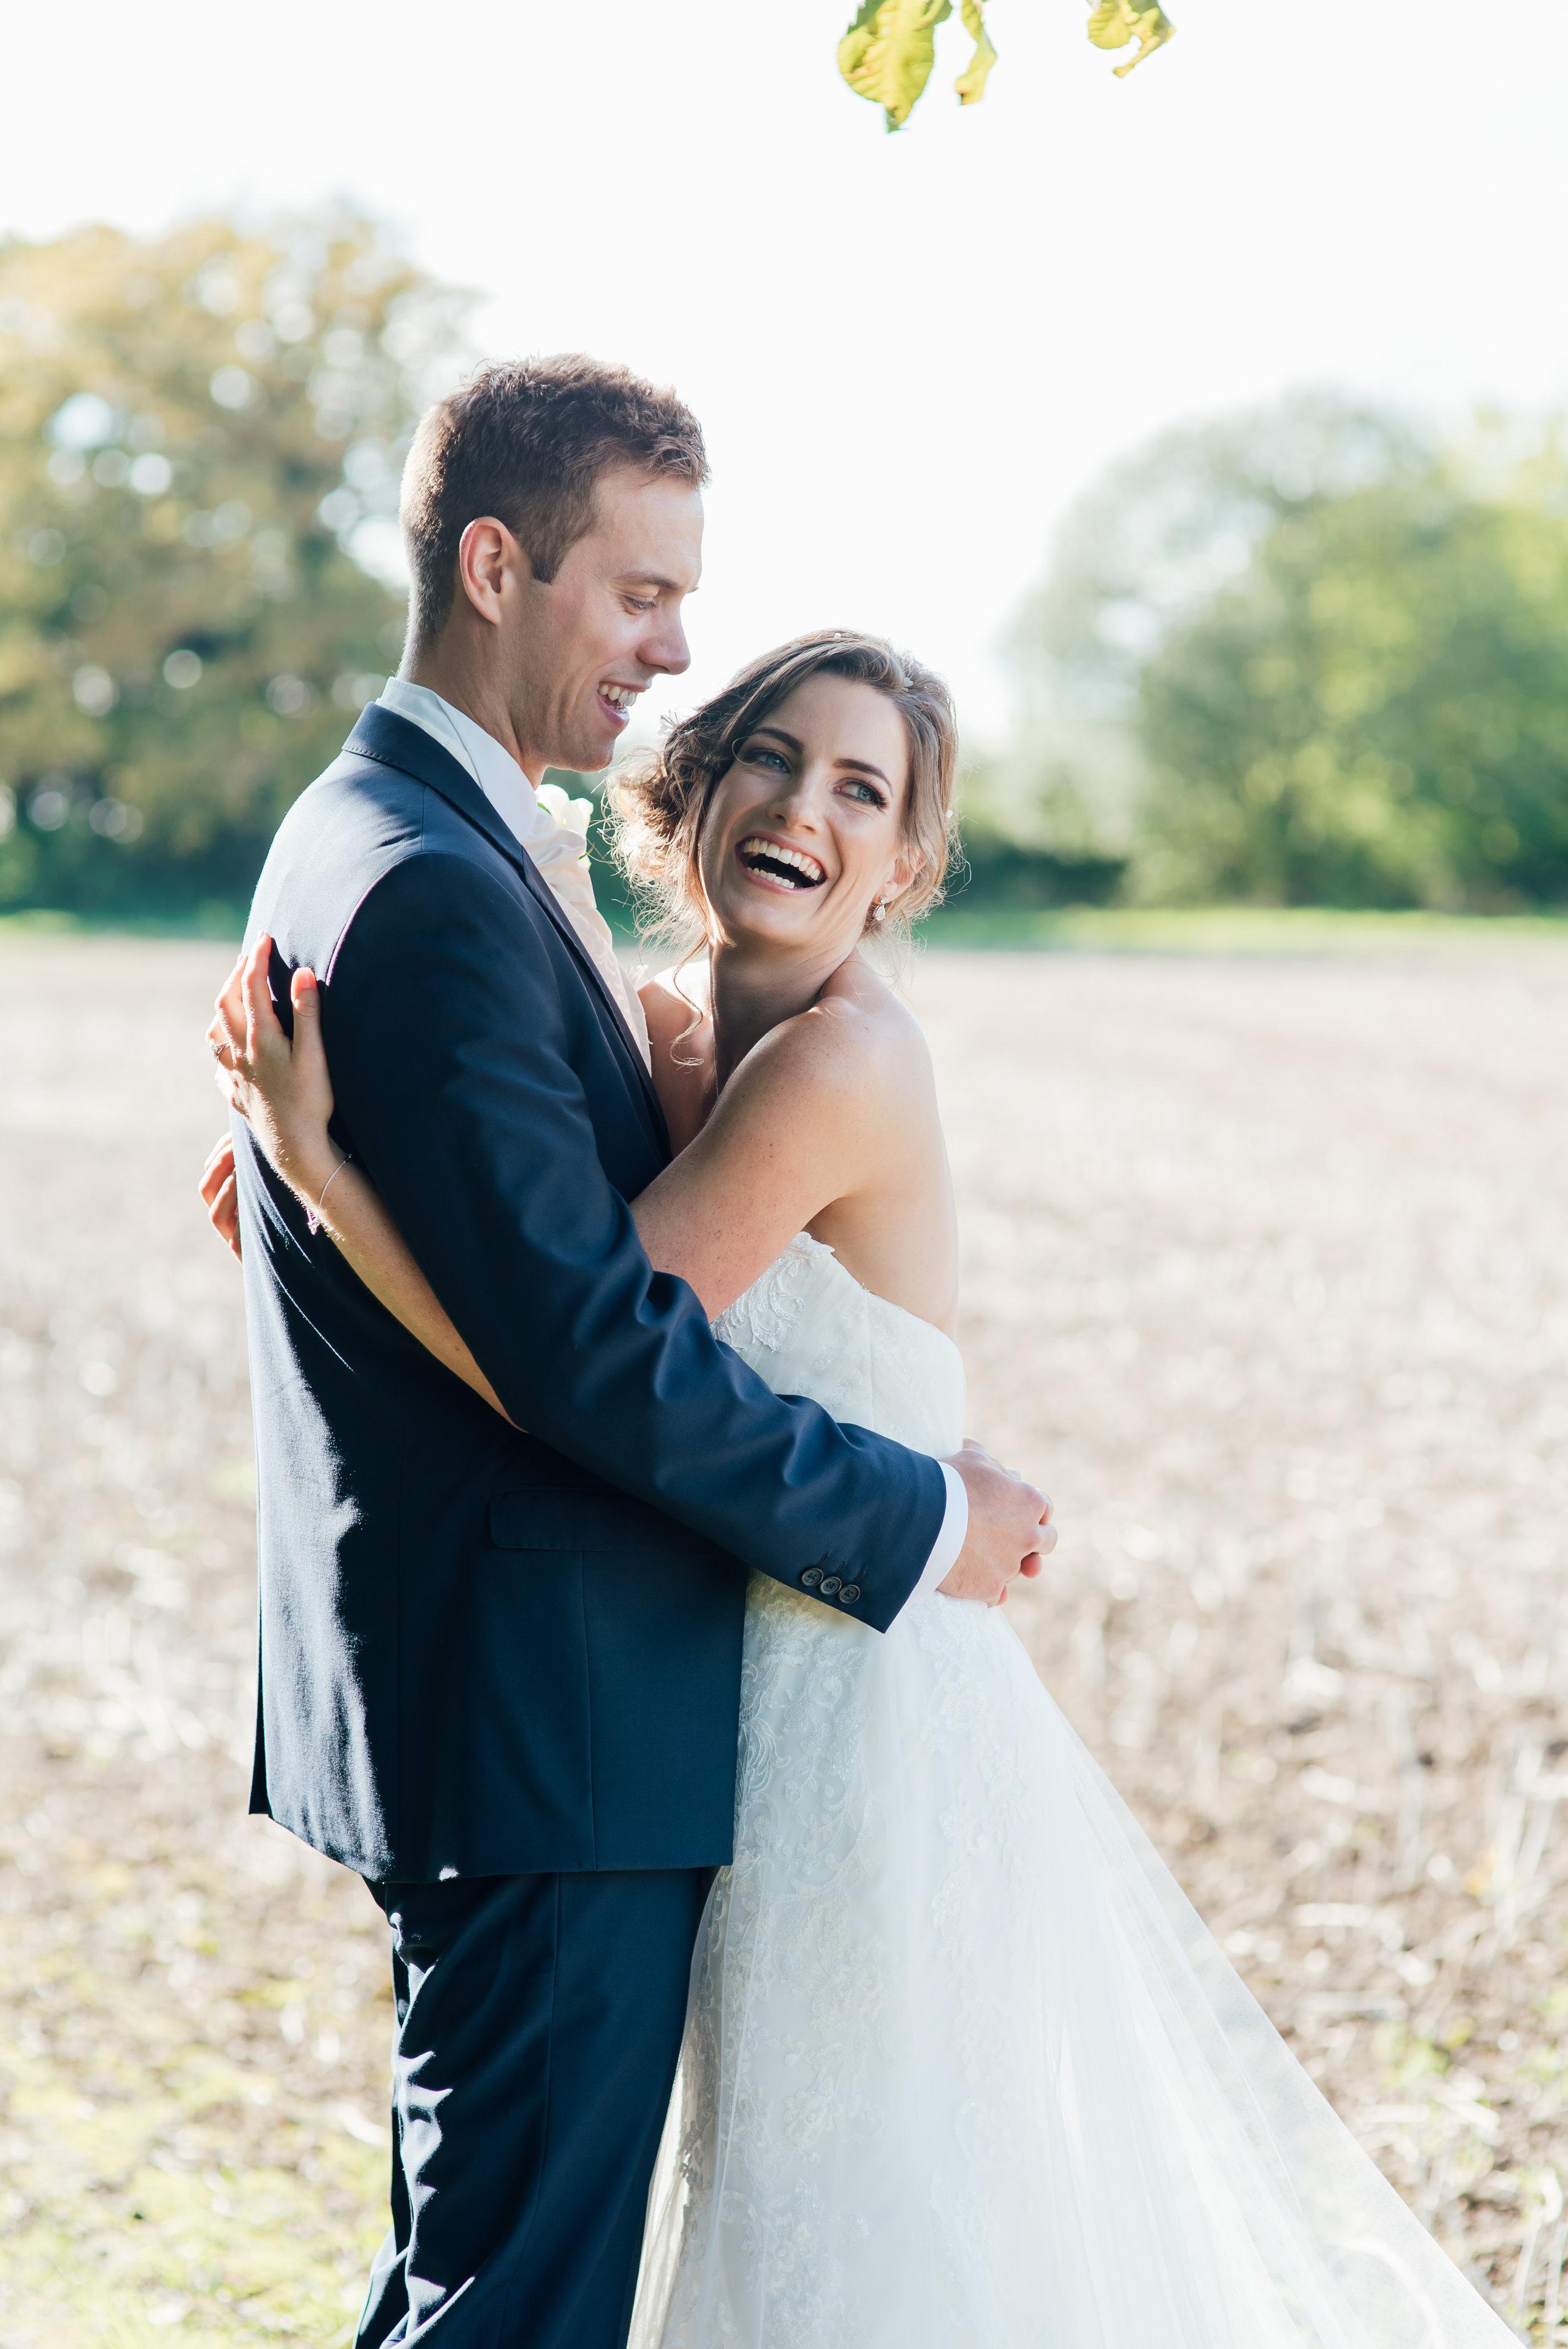 hampshire-wedding-photographer / Amy-james-photography / Hampshire-village-hall-wedding / village-hall-wedding / wedding-photographer-hampshire-surrey-berkshire / rotherwick-village-hall-wedding / Fleet -wedding-photographer